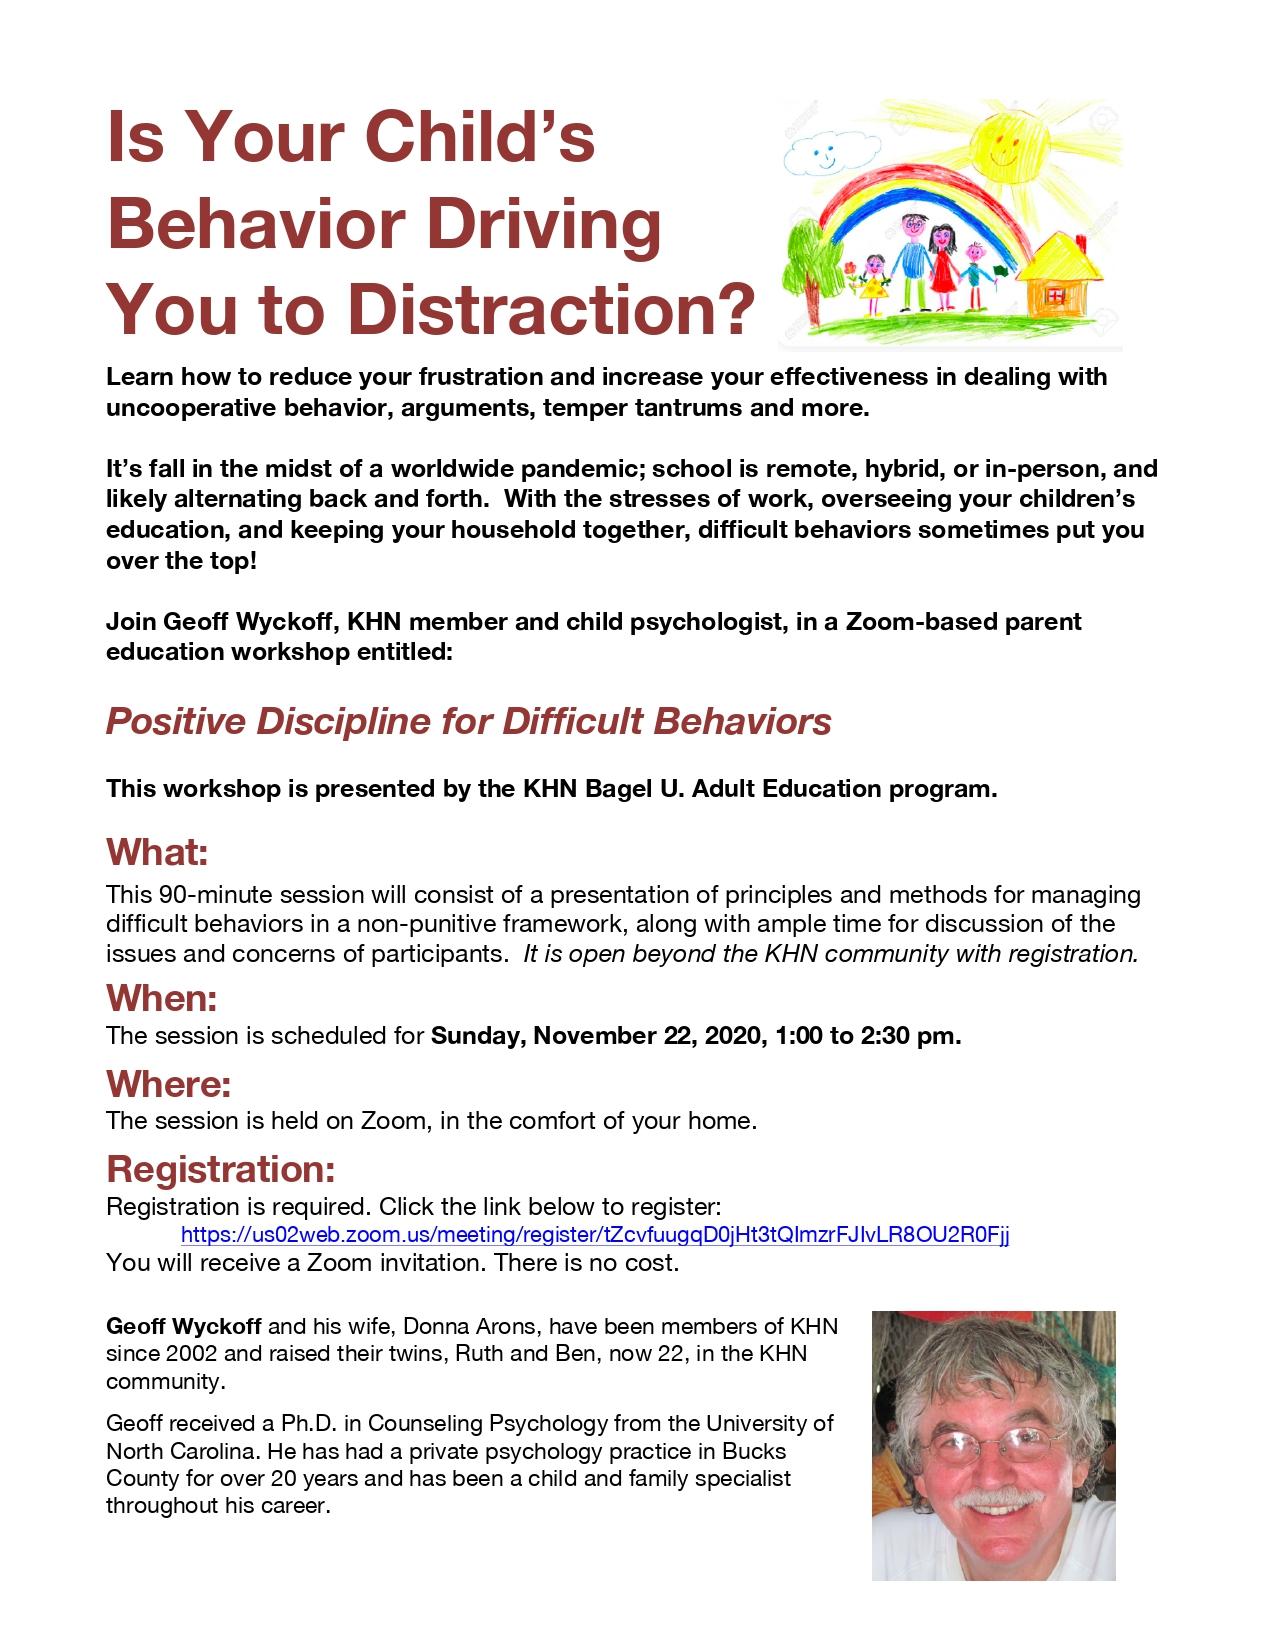 Banner Image for Positive Discipline for Difficult Behaviors